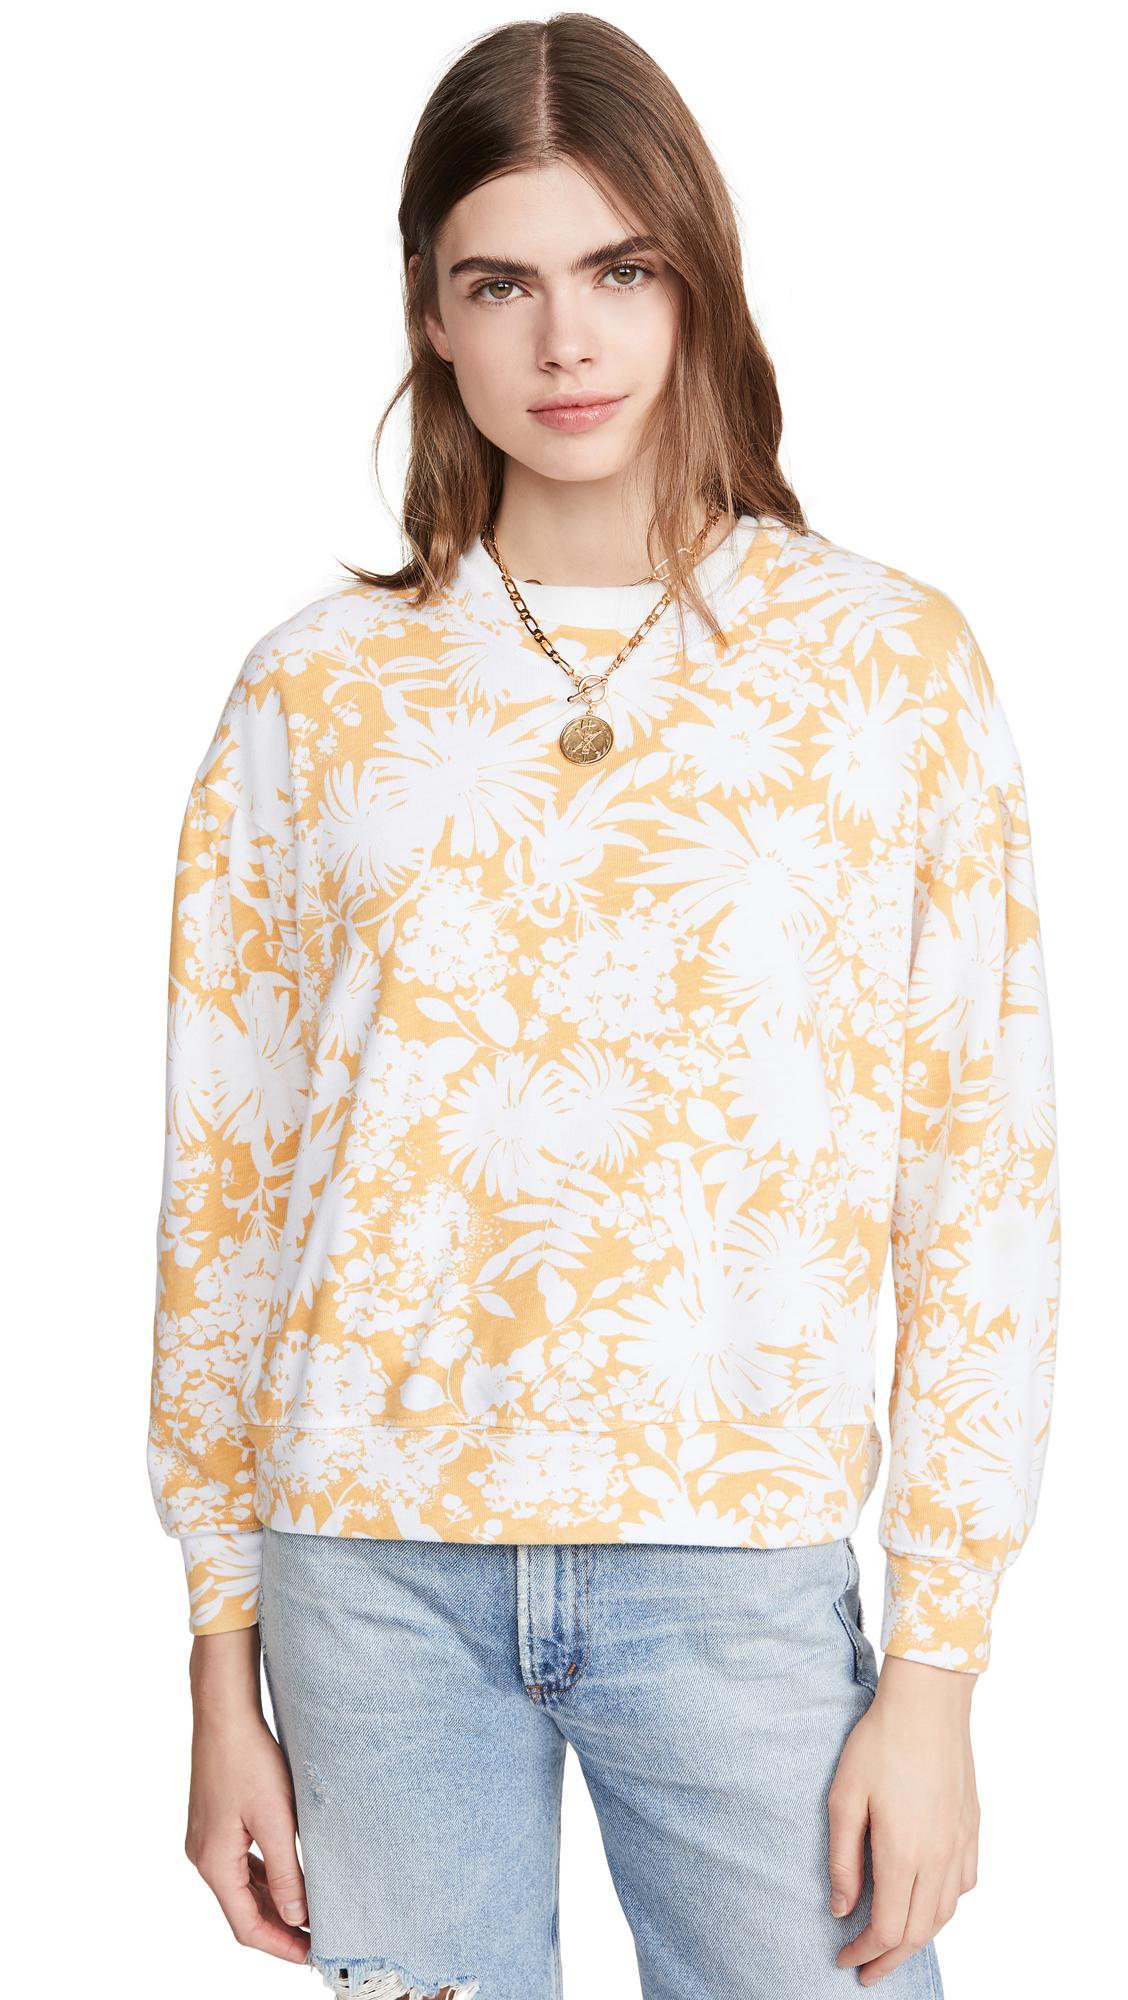 SUNDRY Floral Sweatshirt - 30% Off Sale